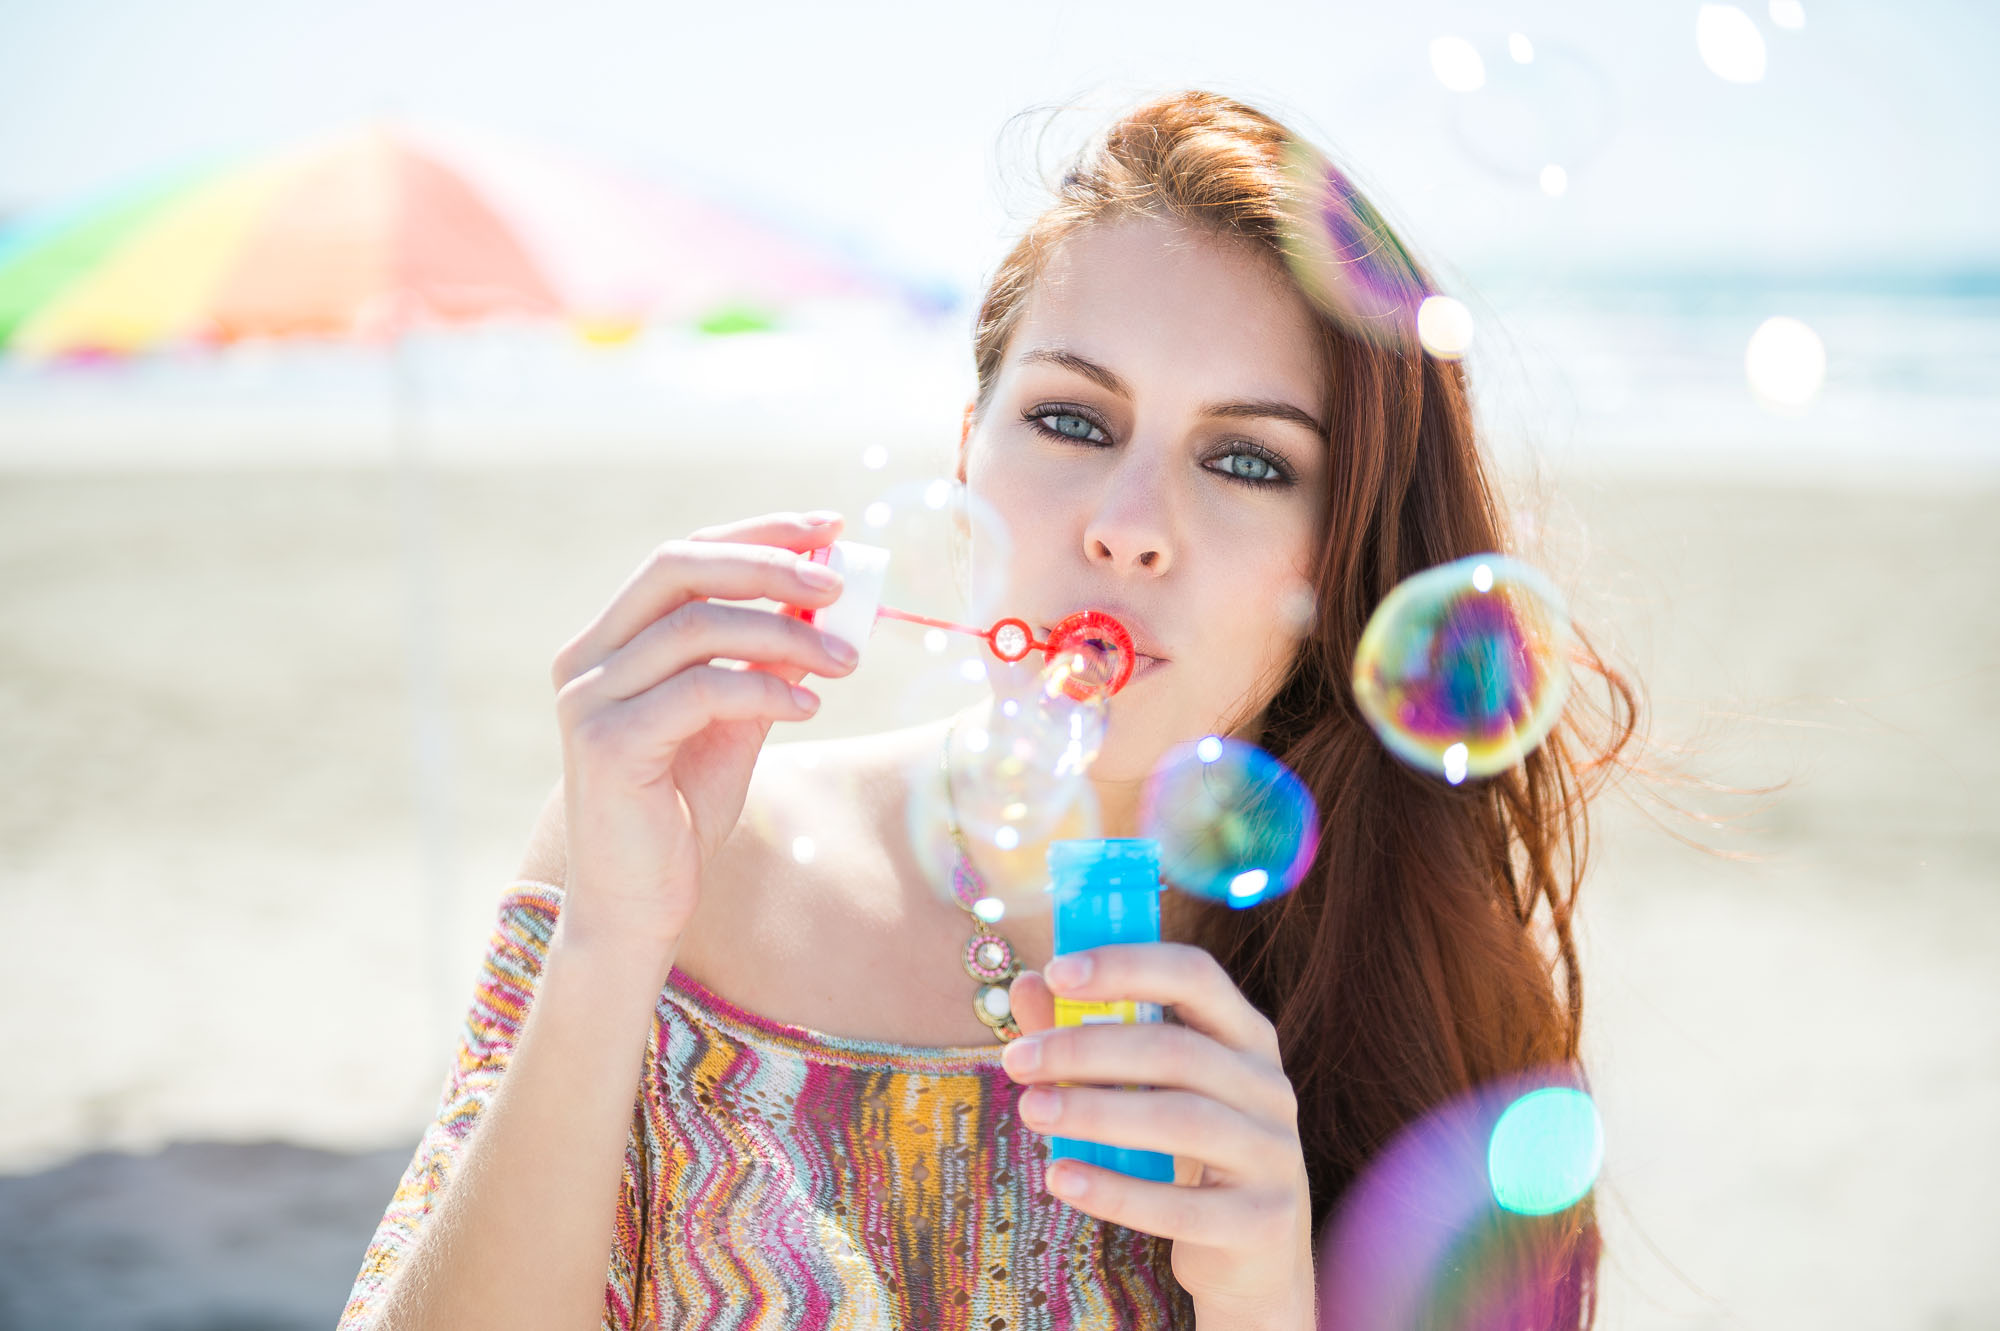 Noba-zomer-2014-modellen-Alicia-small-JPG-016.jpg